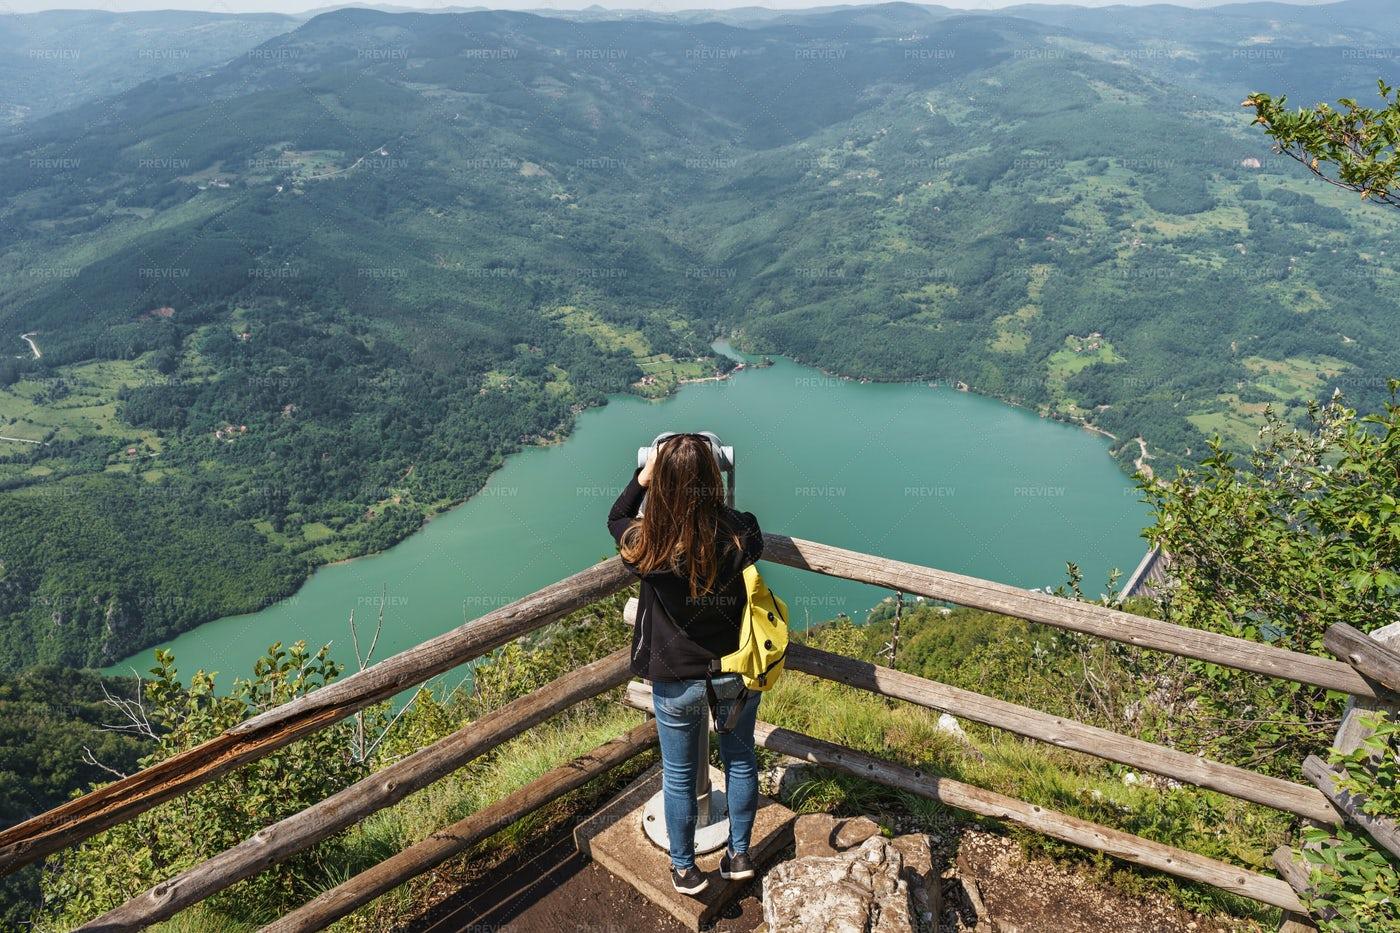 Tourist Woman On Observation Desk: Stock Photos